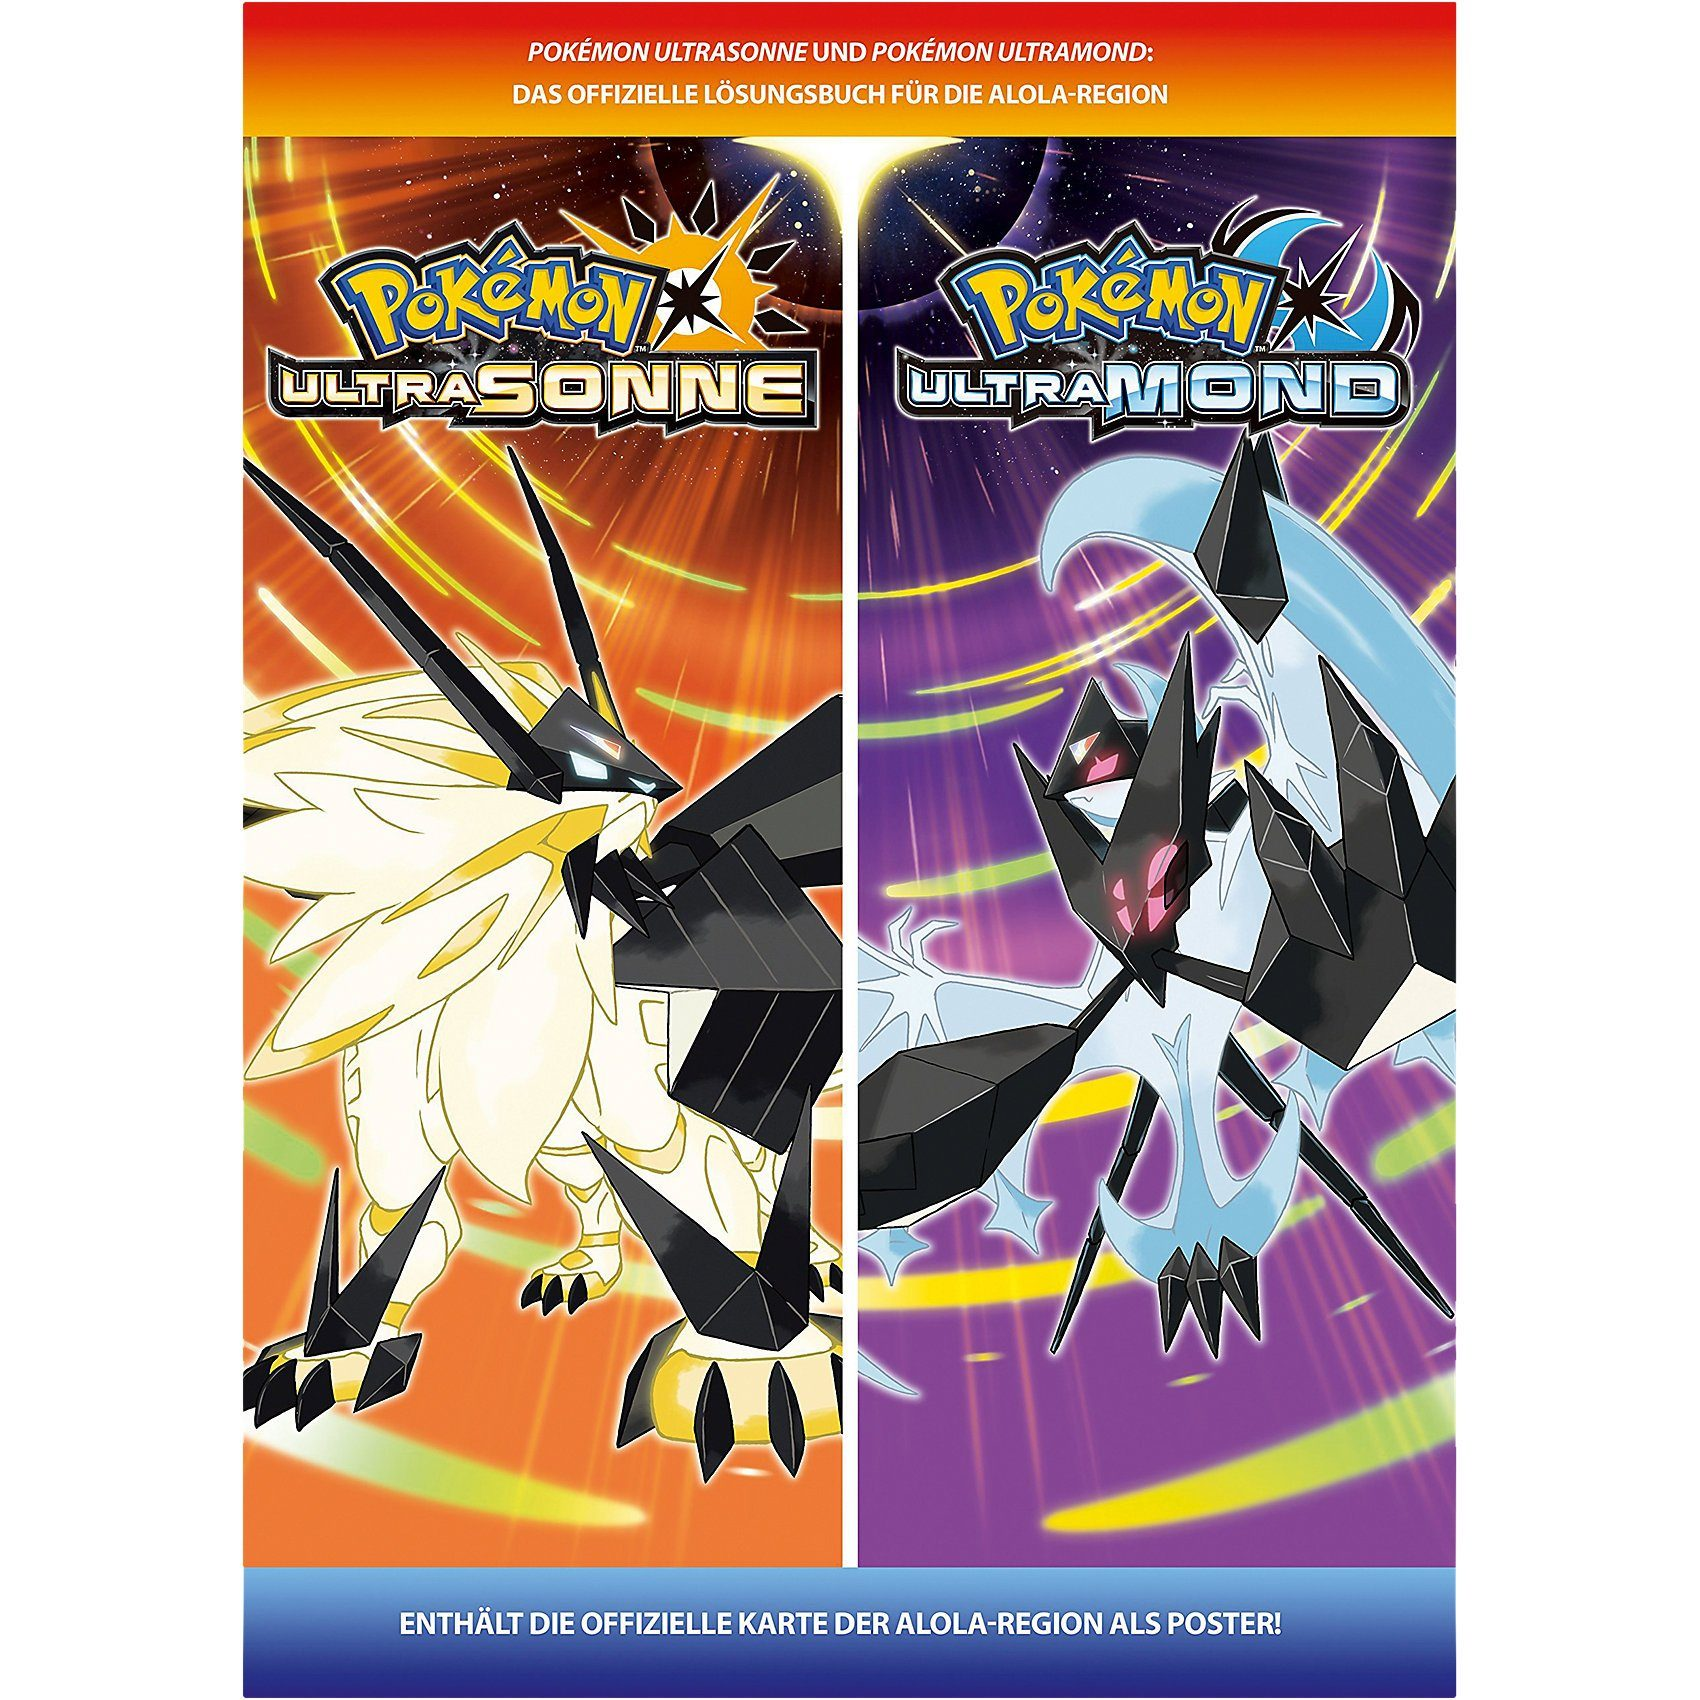 Lösungsbuch Pokemon Ultrasonne und Ultramond - offizielles L